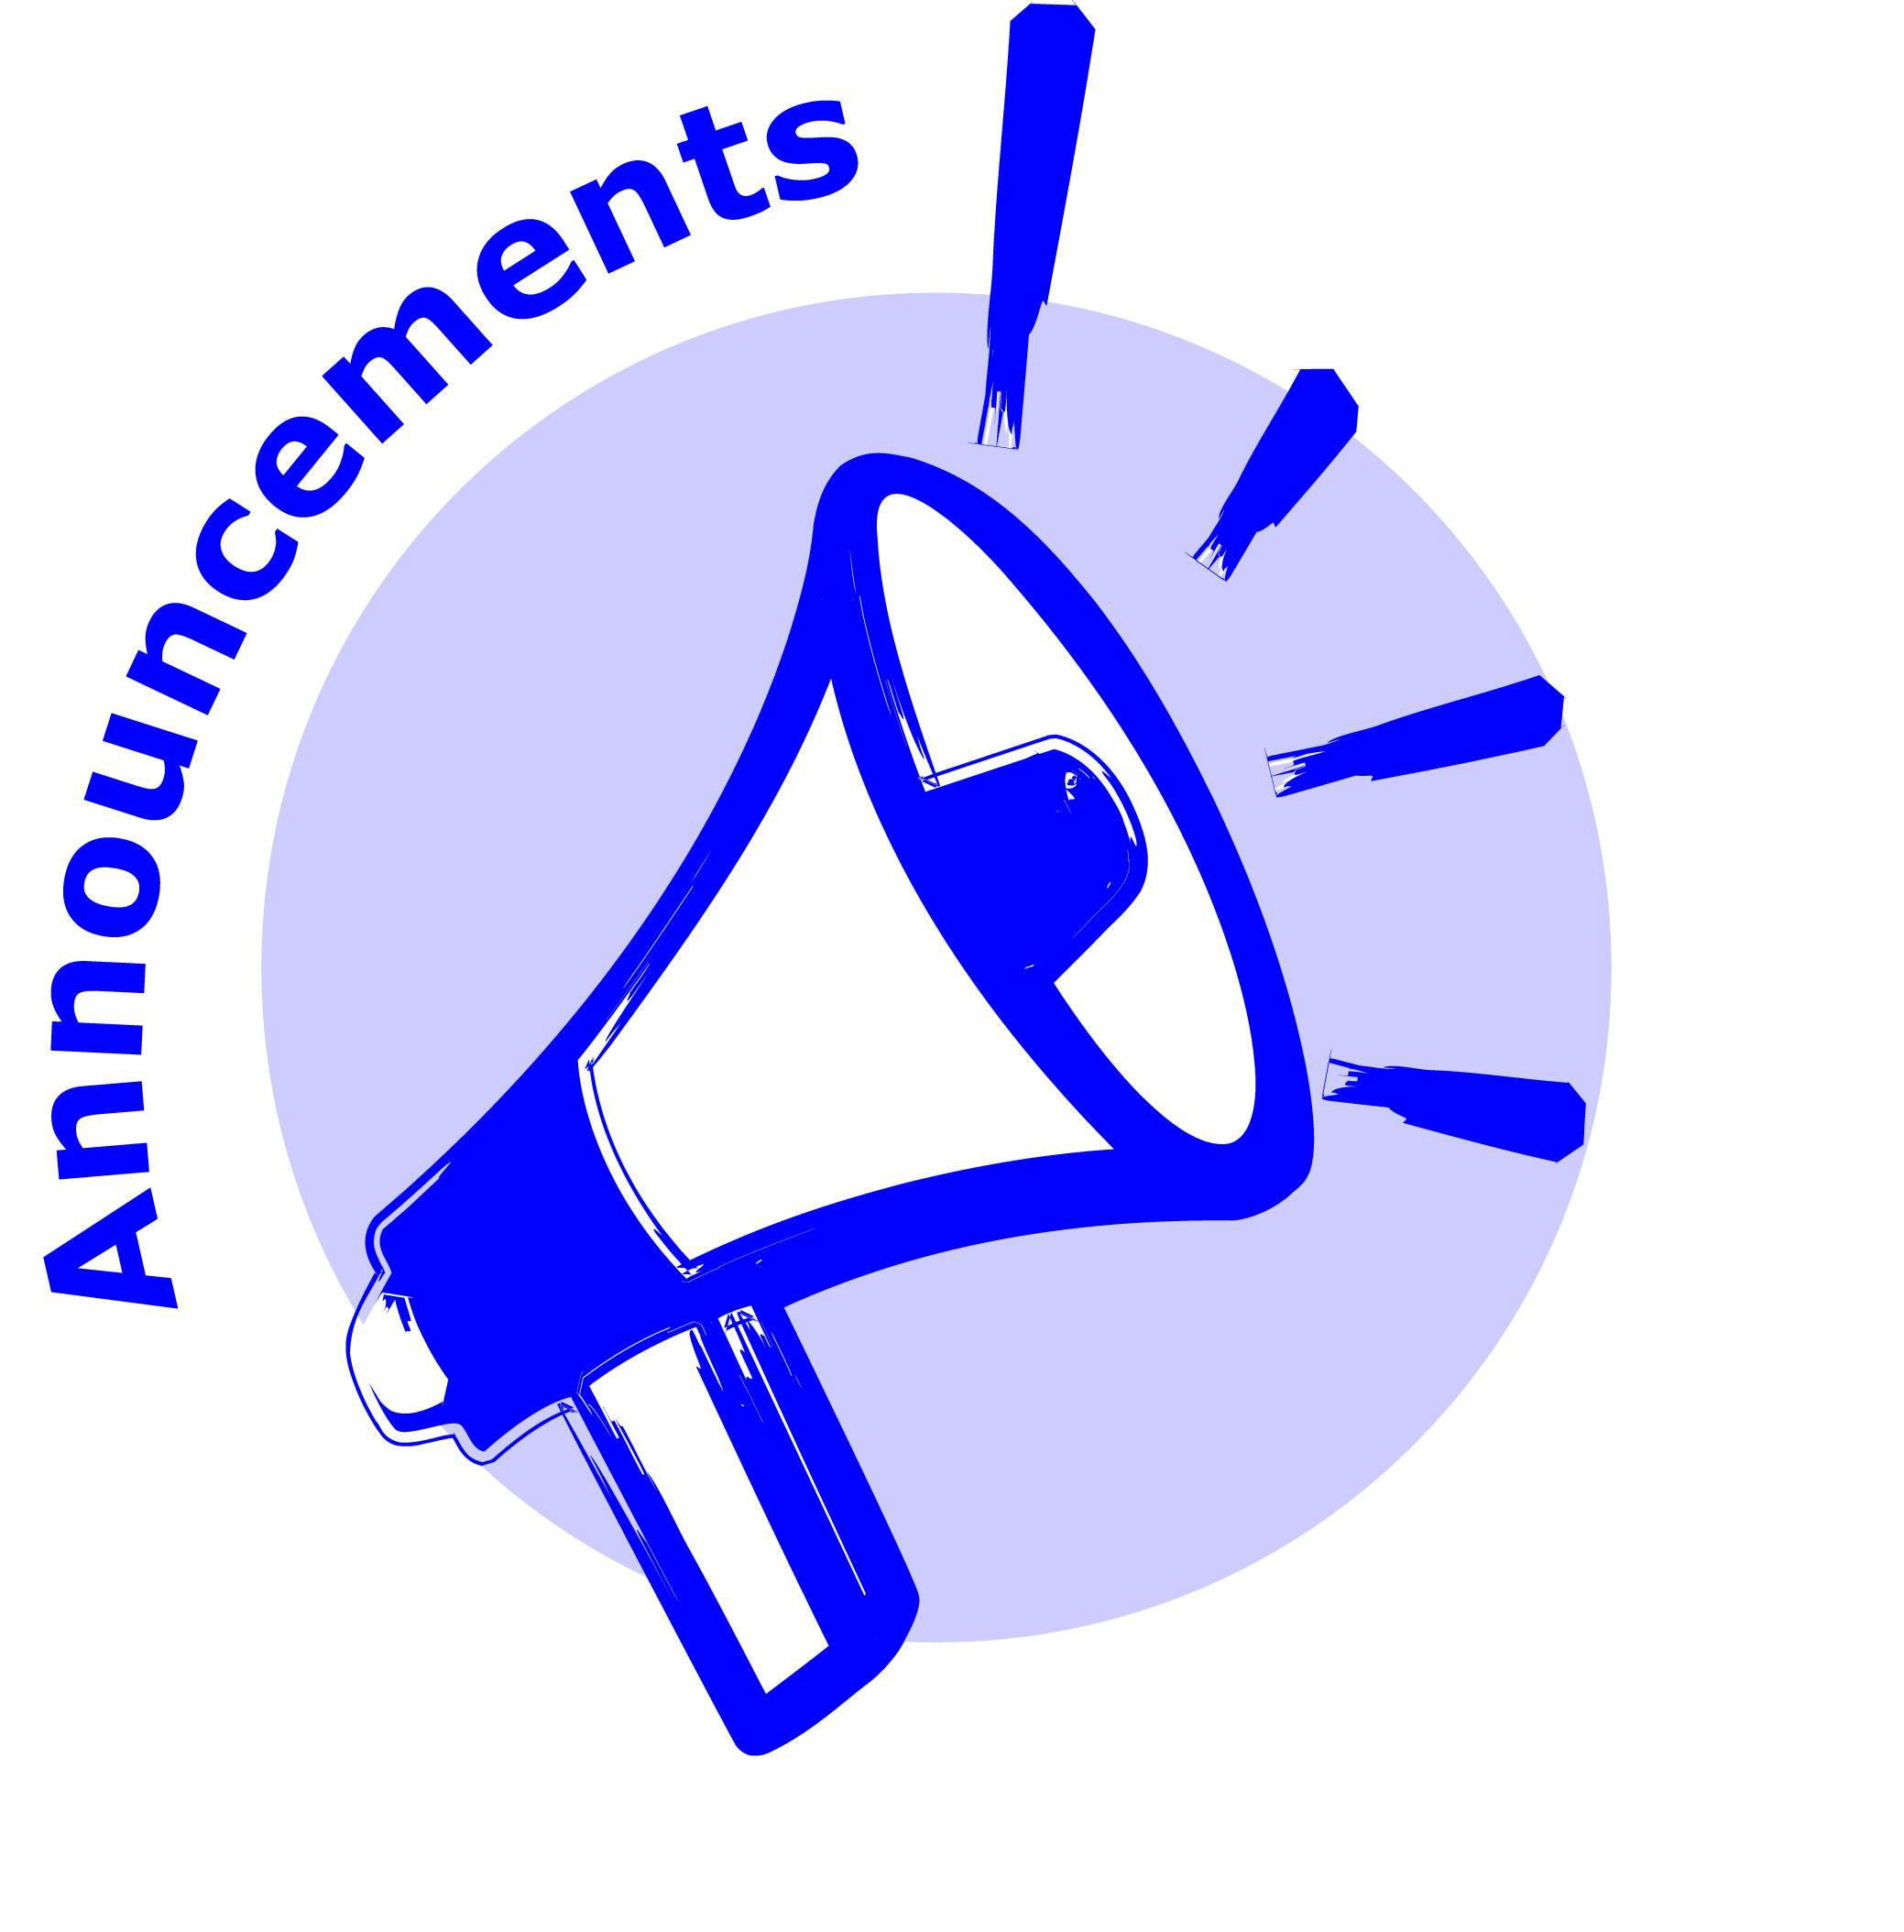 Announcements clipart images clip freeuse library Free Announcements Cliparts, Download Free Clip Art, Free Clip Art ... clip freeuse library